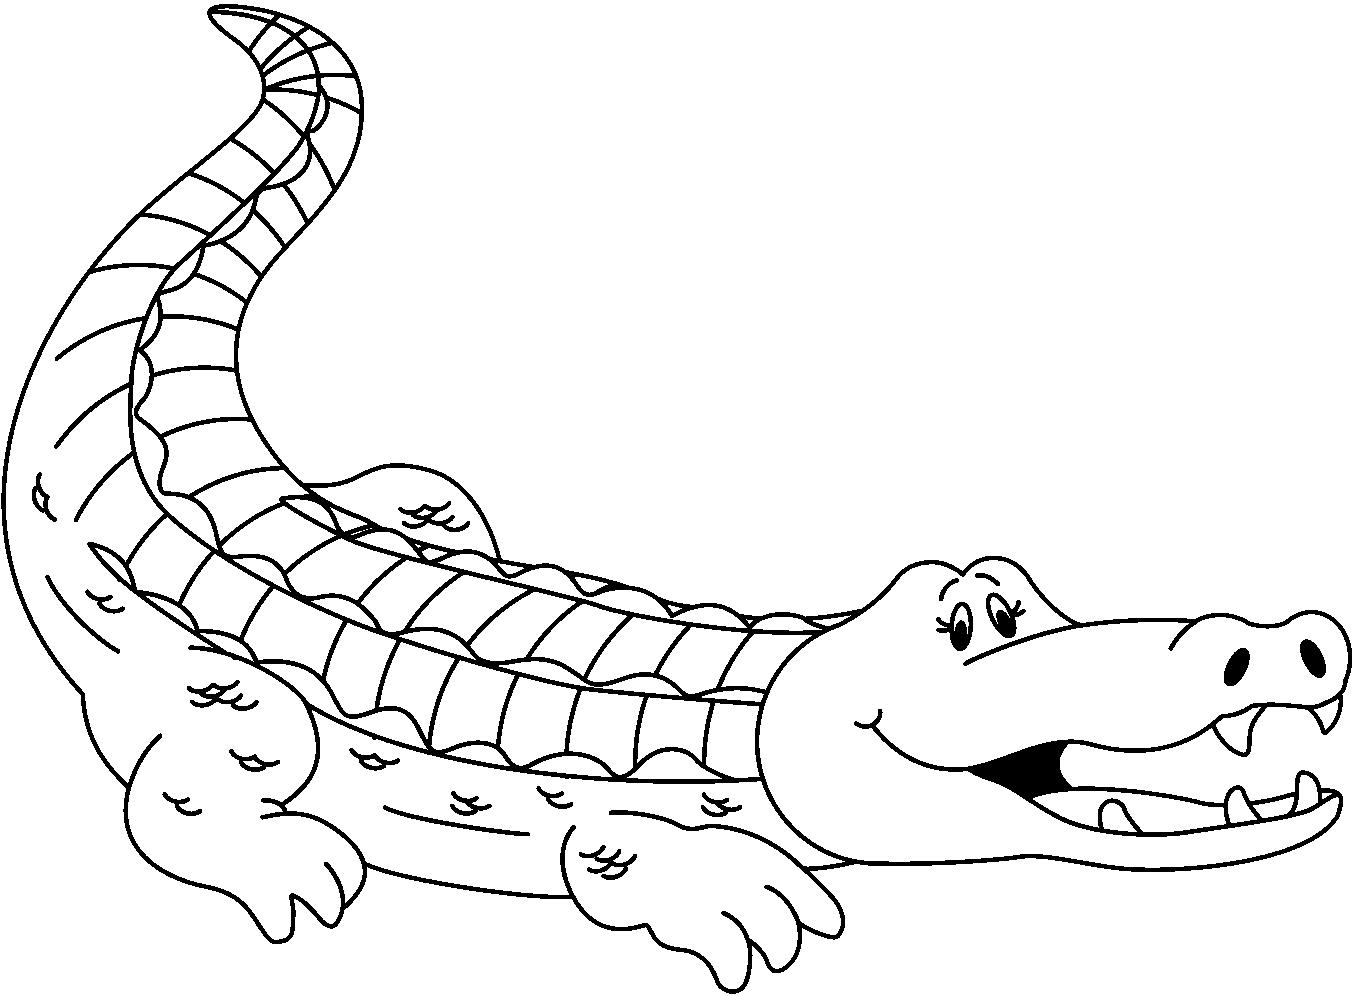 Free Crocodile Cliparts, Download Free Clip Art, Free Clip Art on.